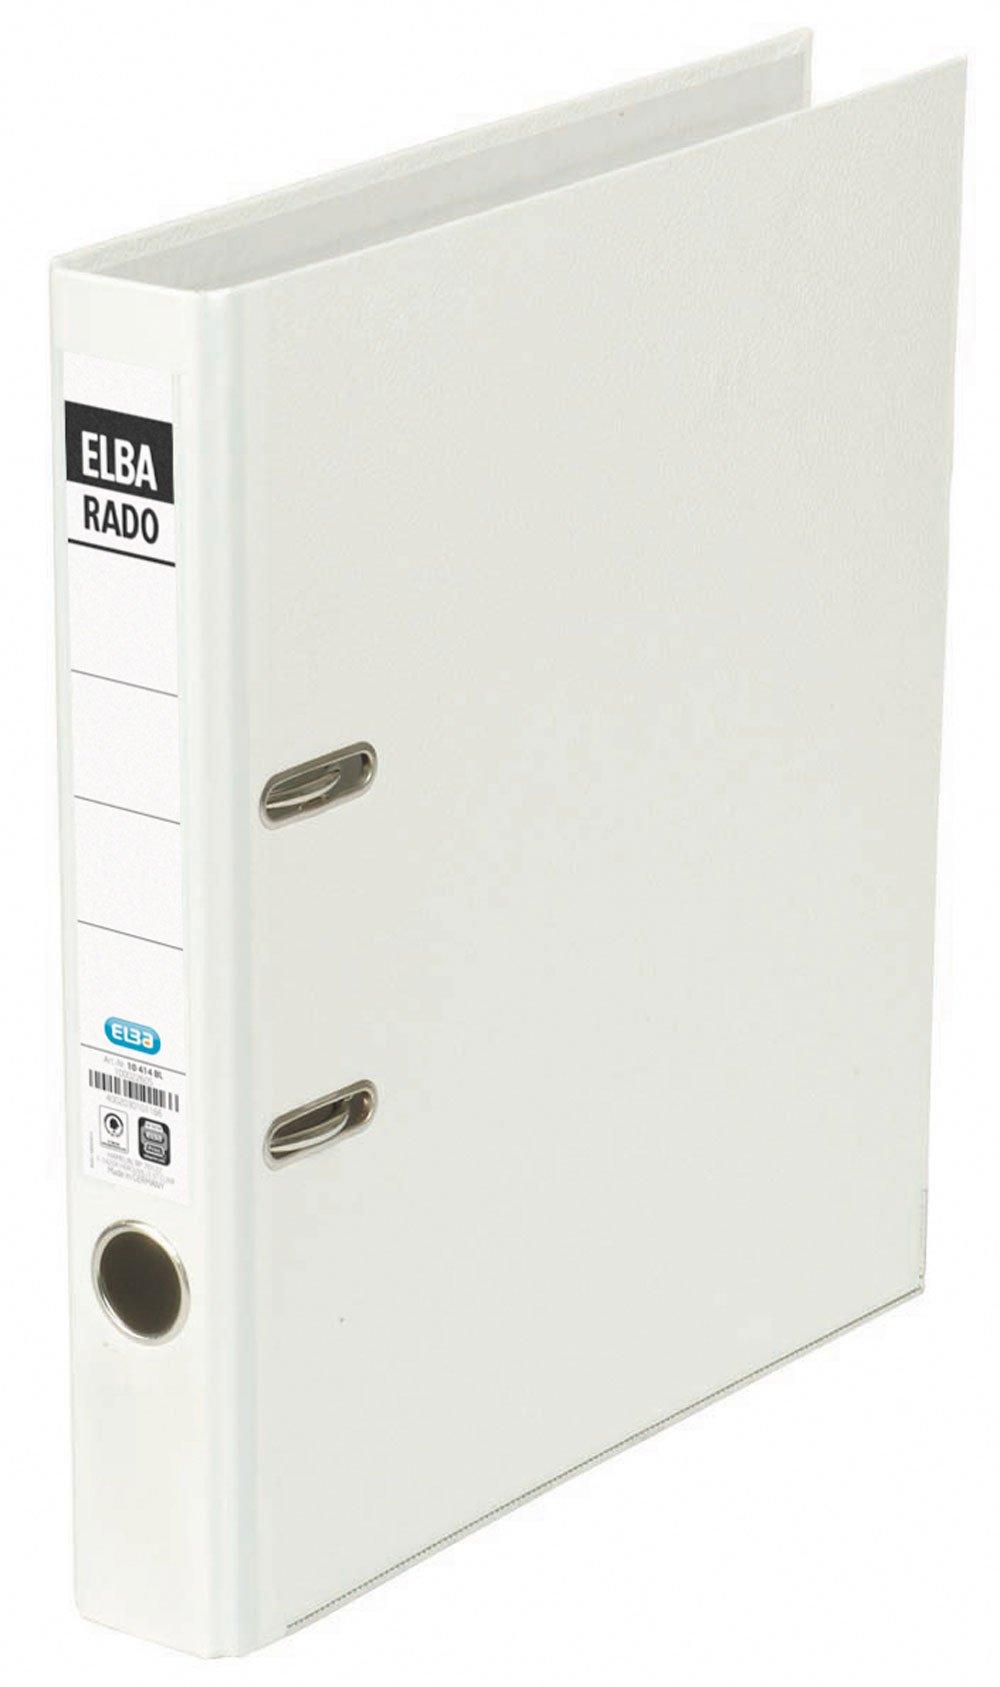 Elba 100022611 Folder A4 Spine Width 5 cm Interchangeable Spine Label/White